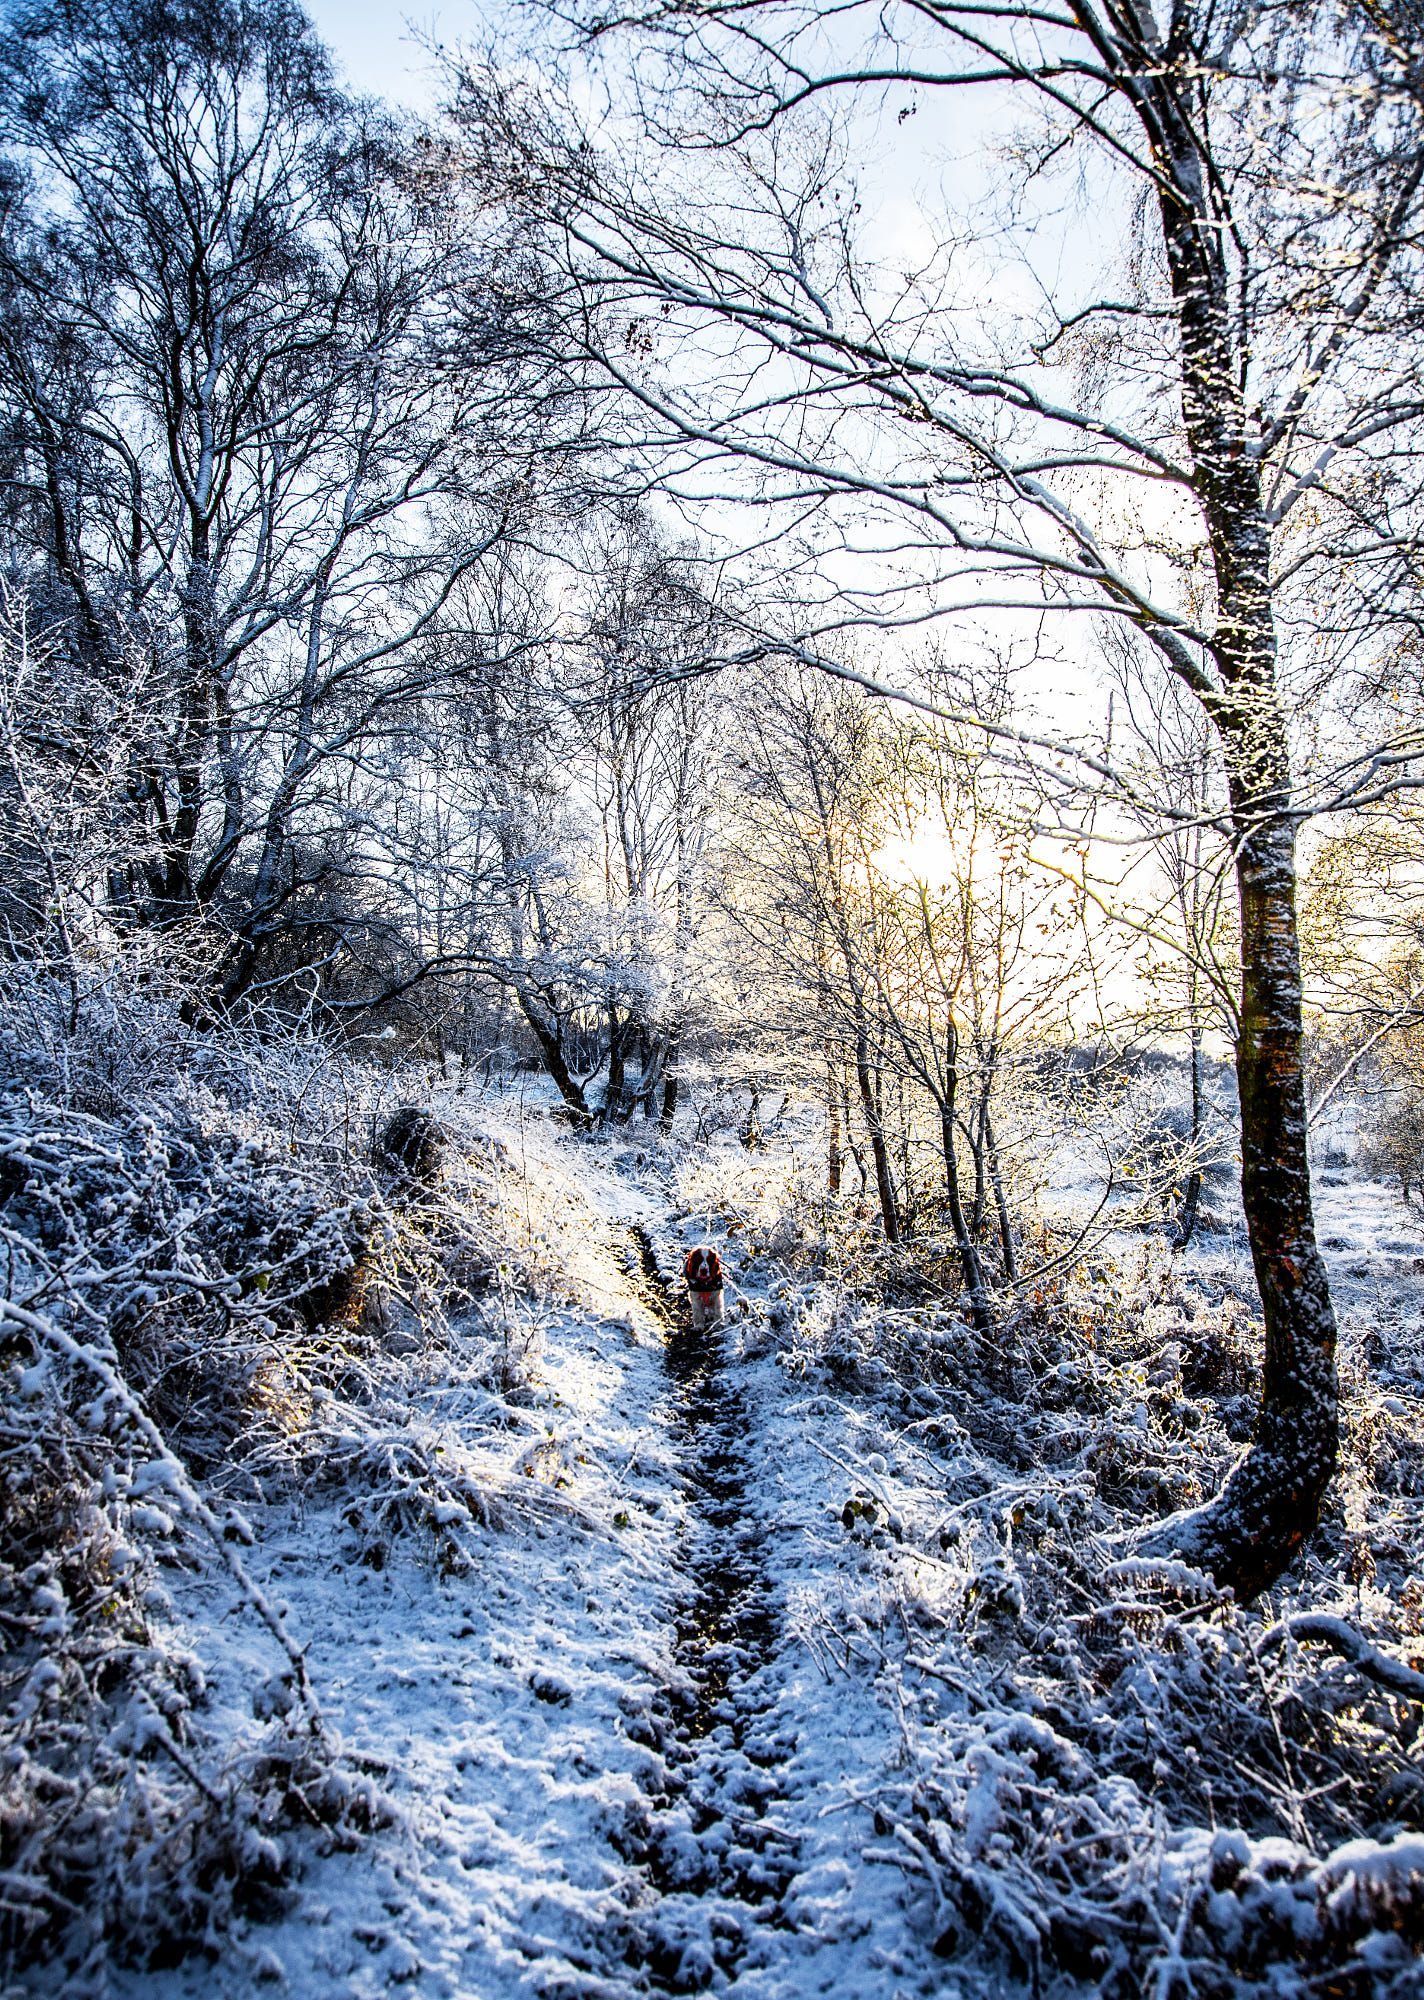 Küchenideen für wohnmobile first snow fall no location given by paul antony spilsburycr